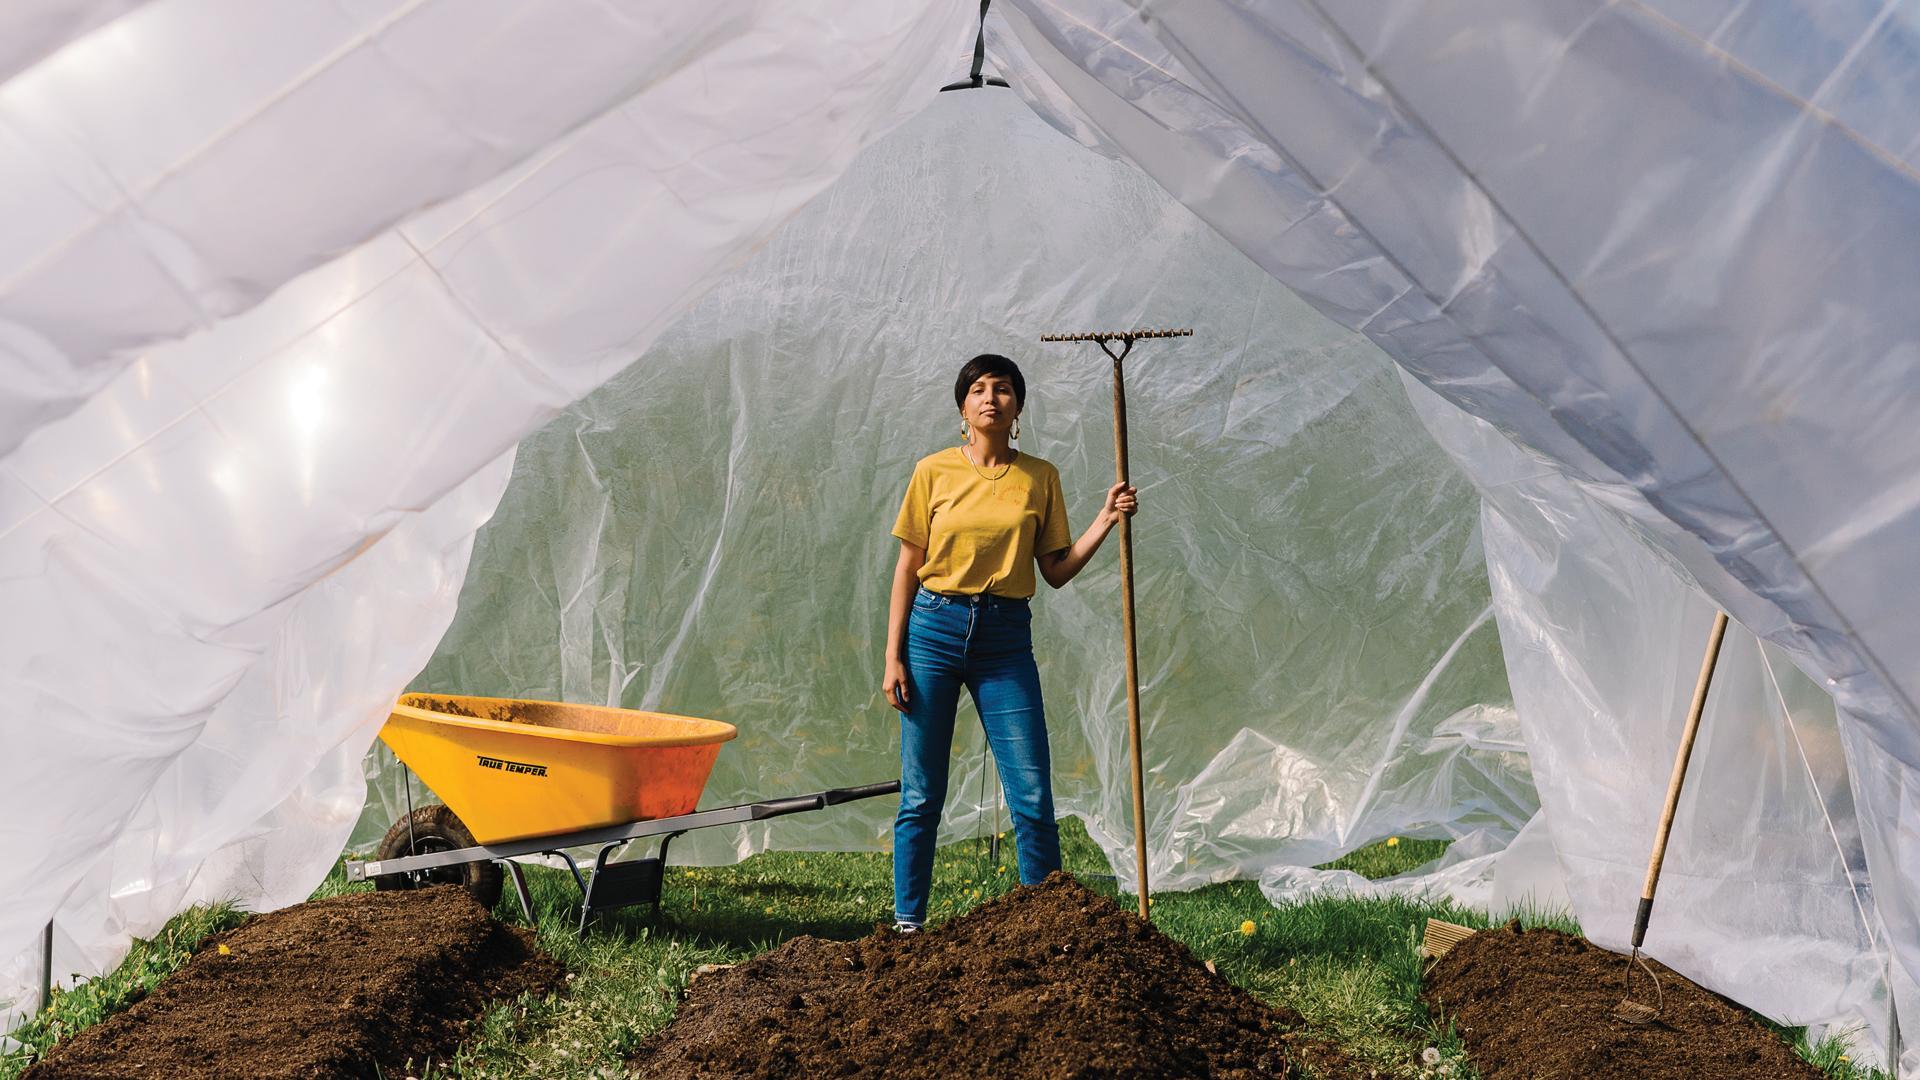 The future of farming is BIPOC | Aminah Haghighi farming in P.E.C.